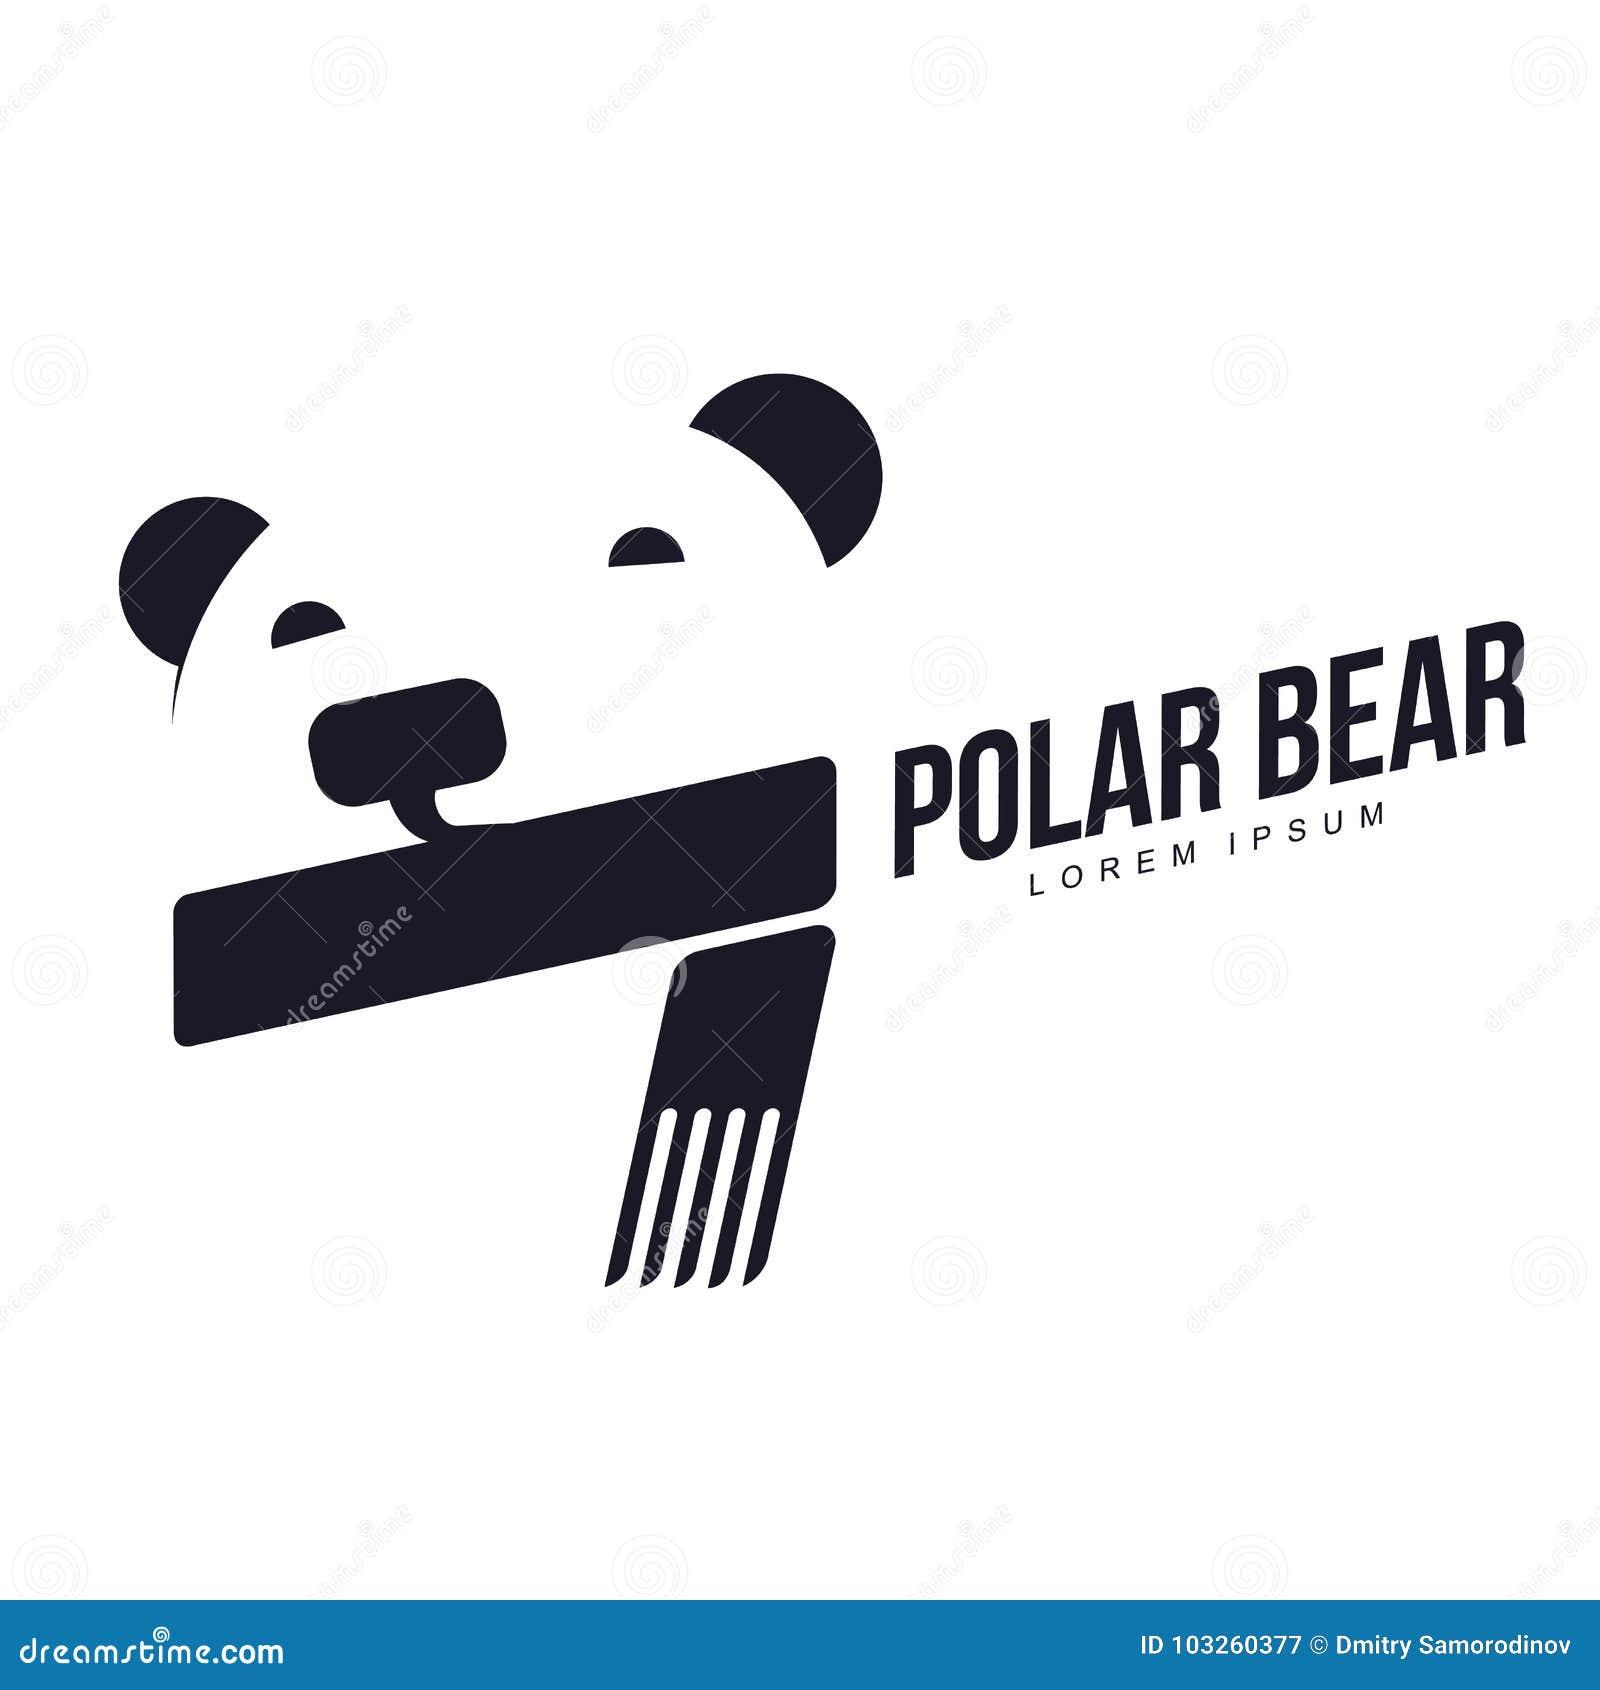 Polar bear logo stock illustration illustration of face 103260377 download polar bear logo stock illustration illustration of face 103260377 maxwellsz